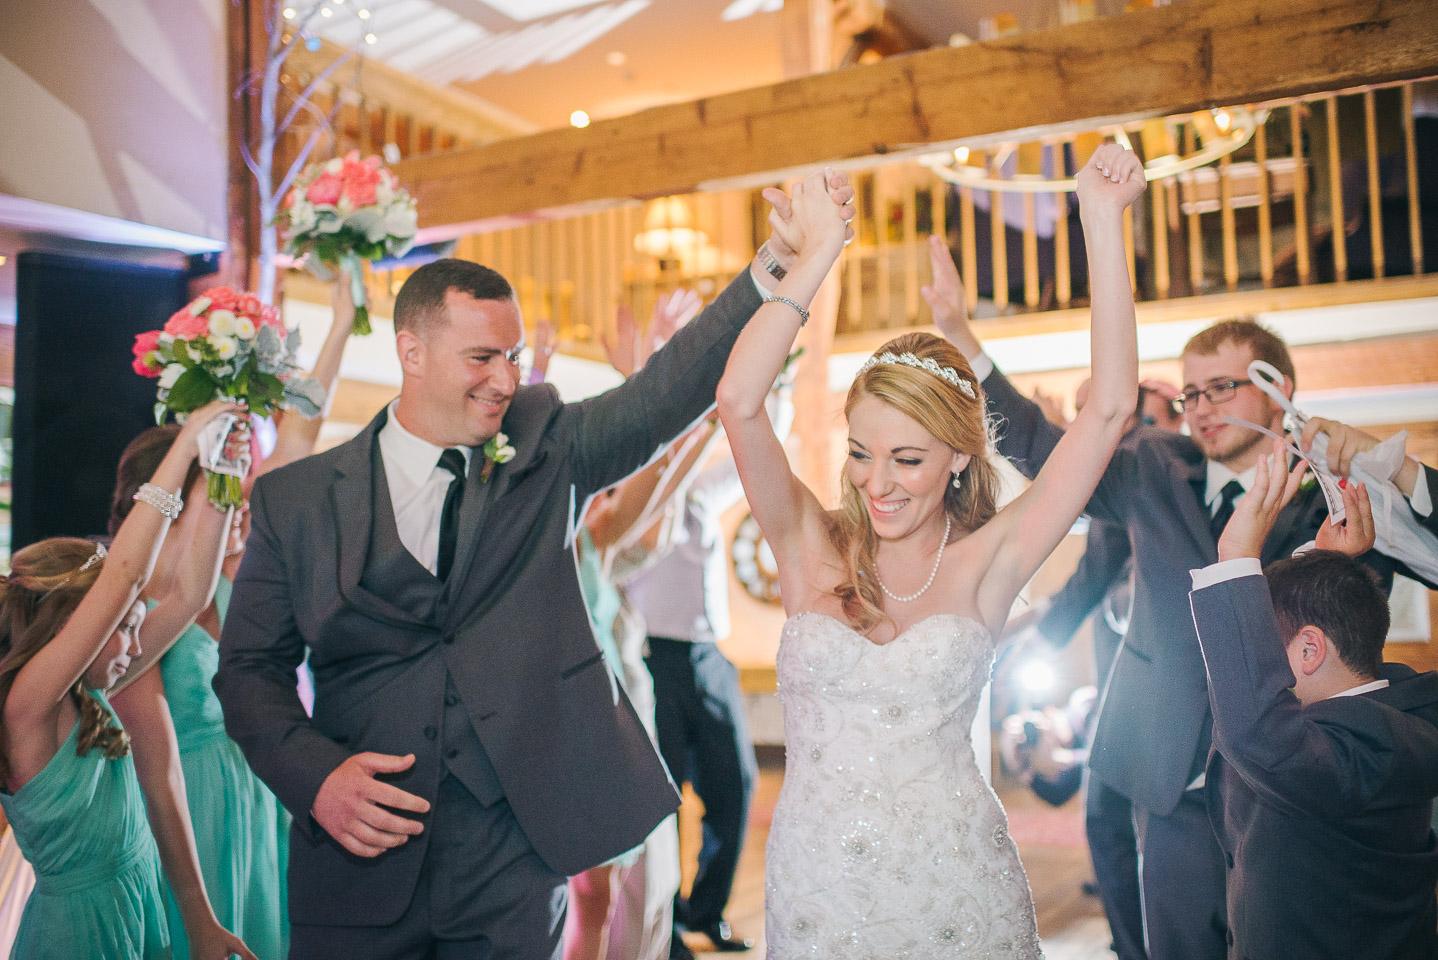 NH Wedding Photographer: newlyweds introductions